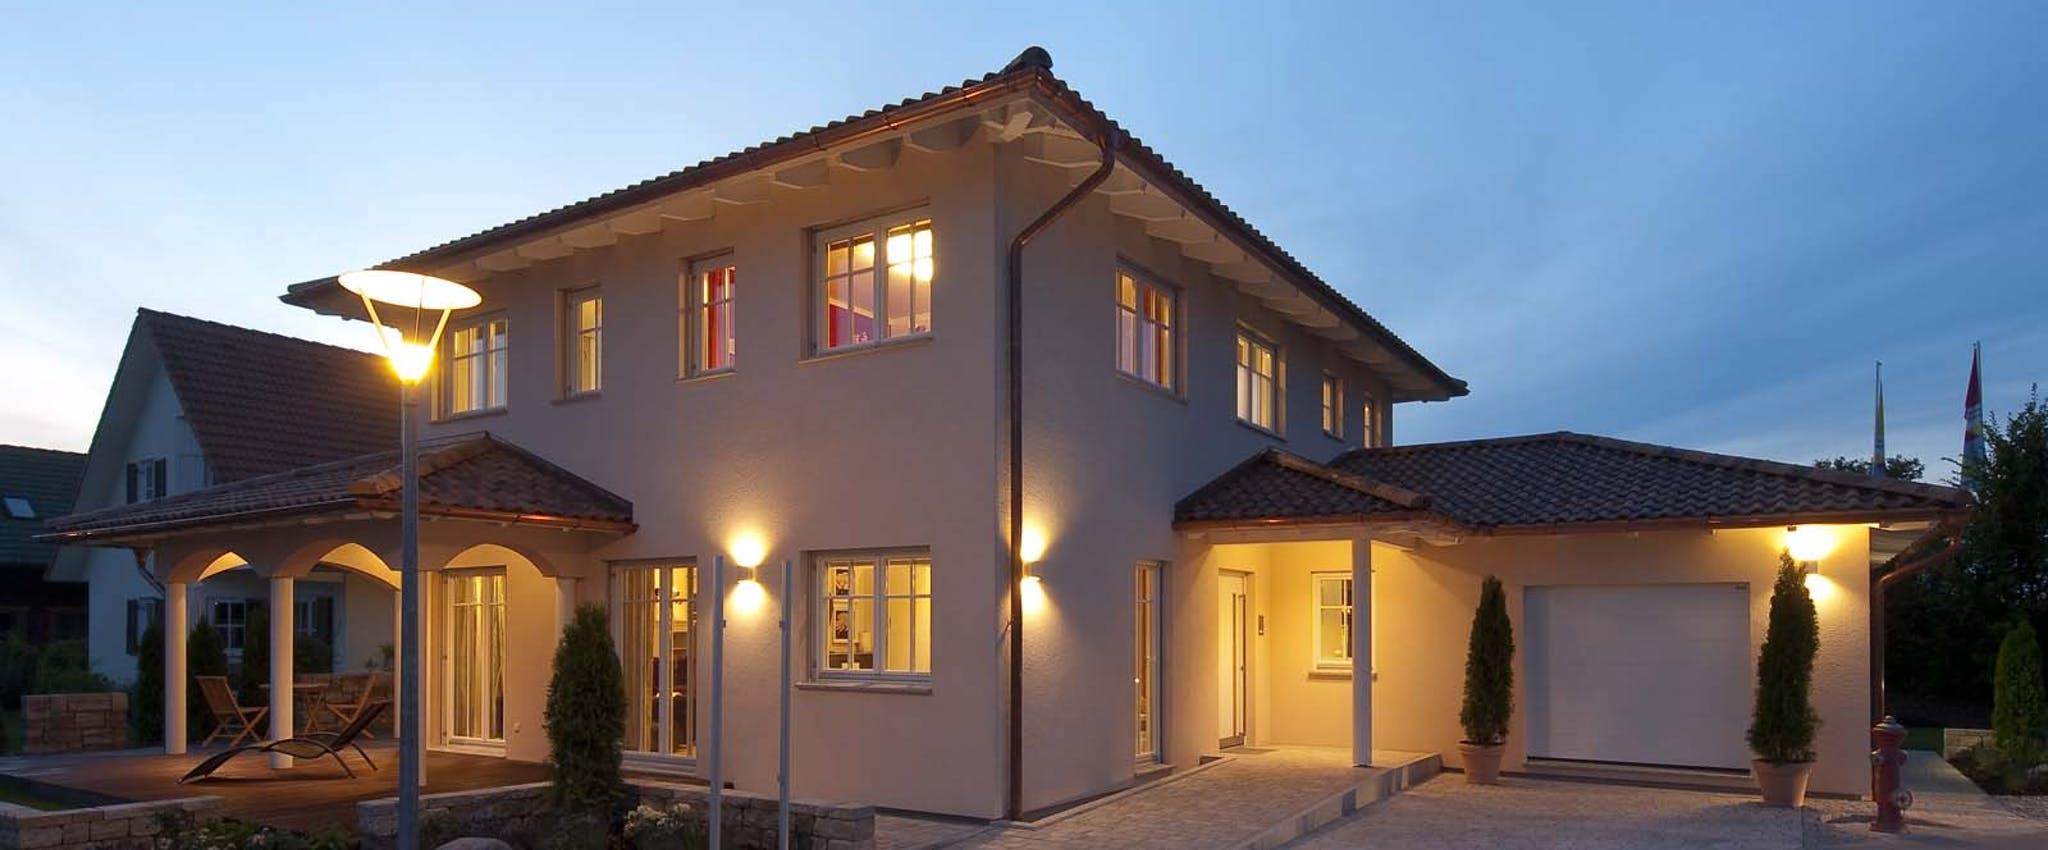 Mediterranes Haus Fertighausde